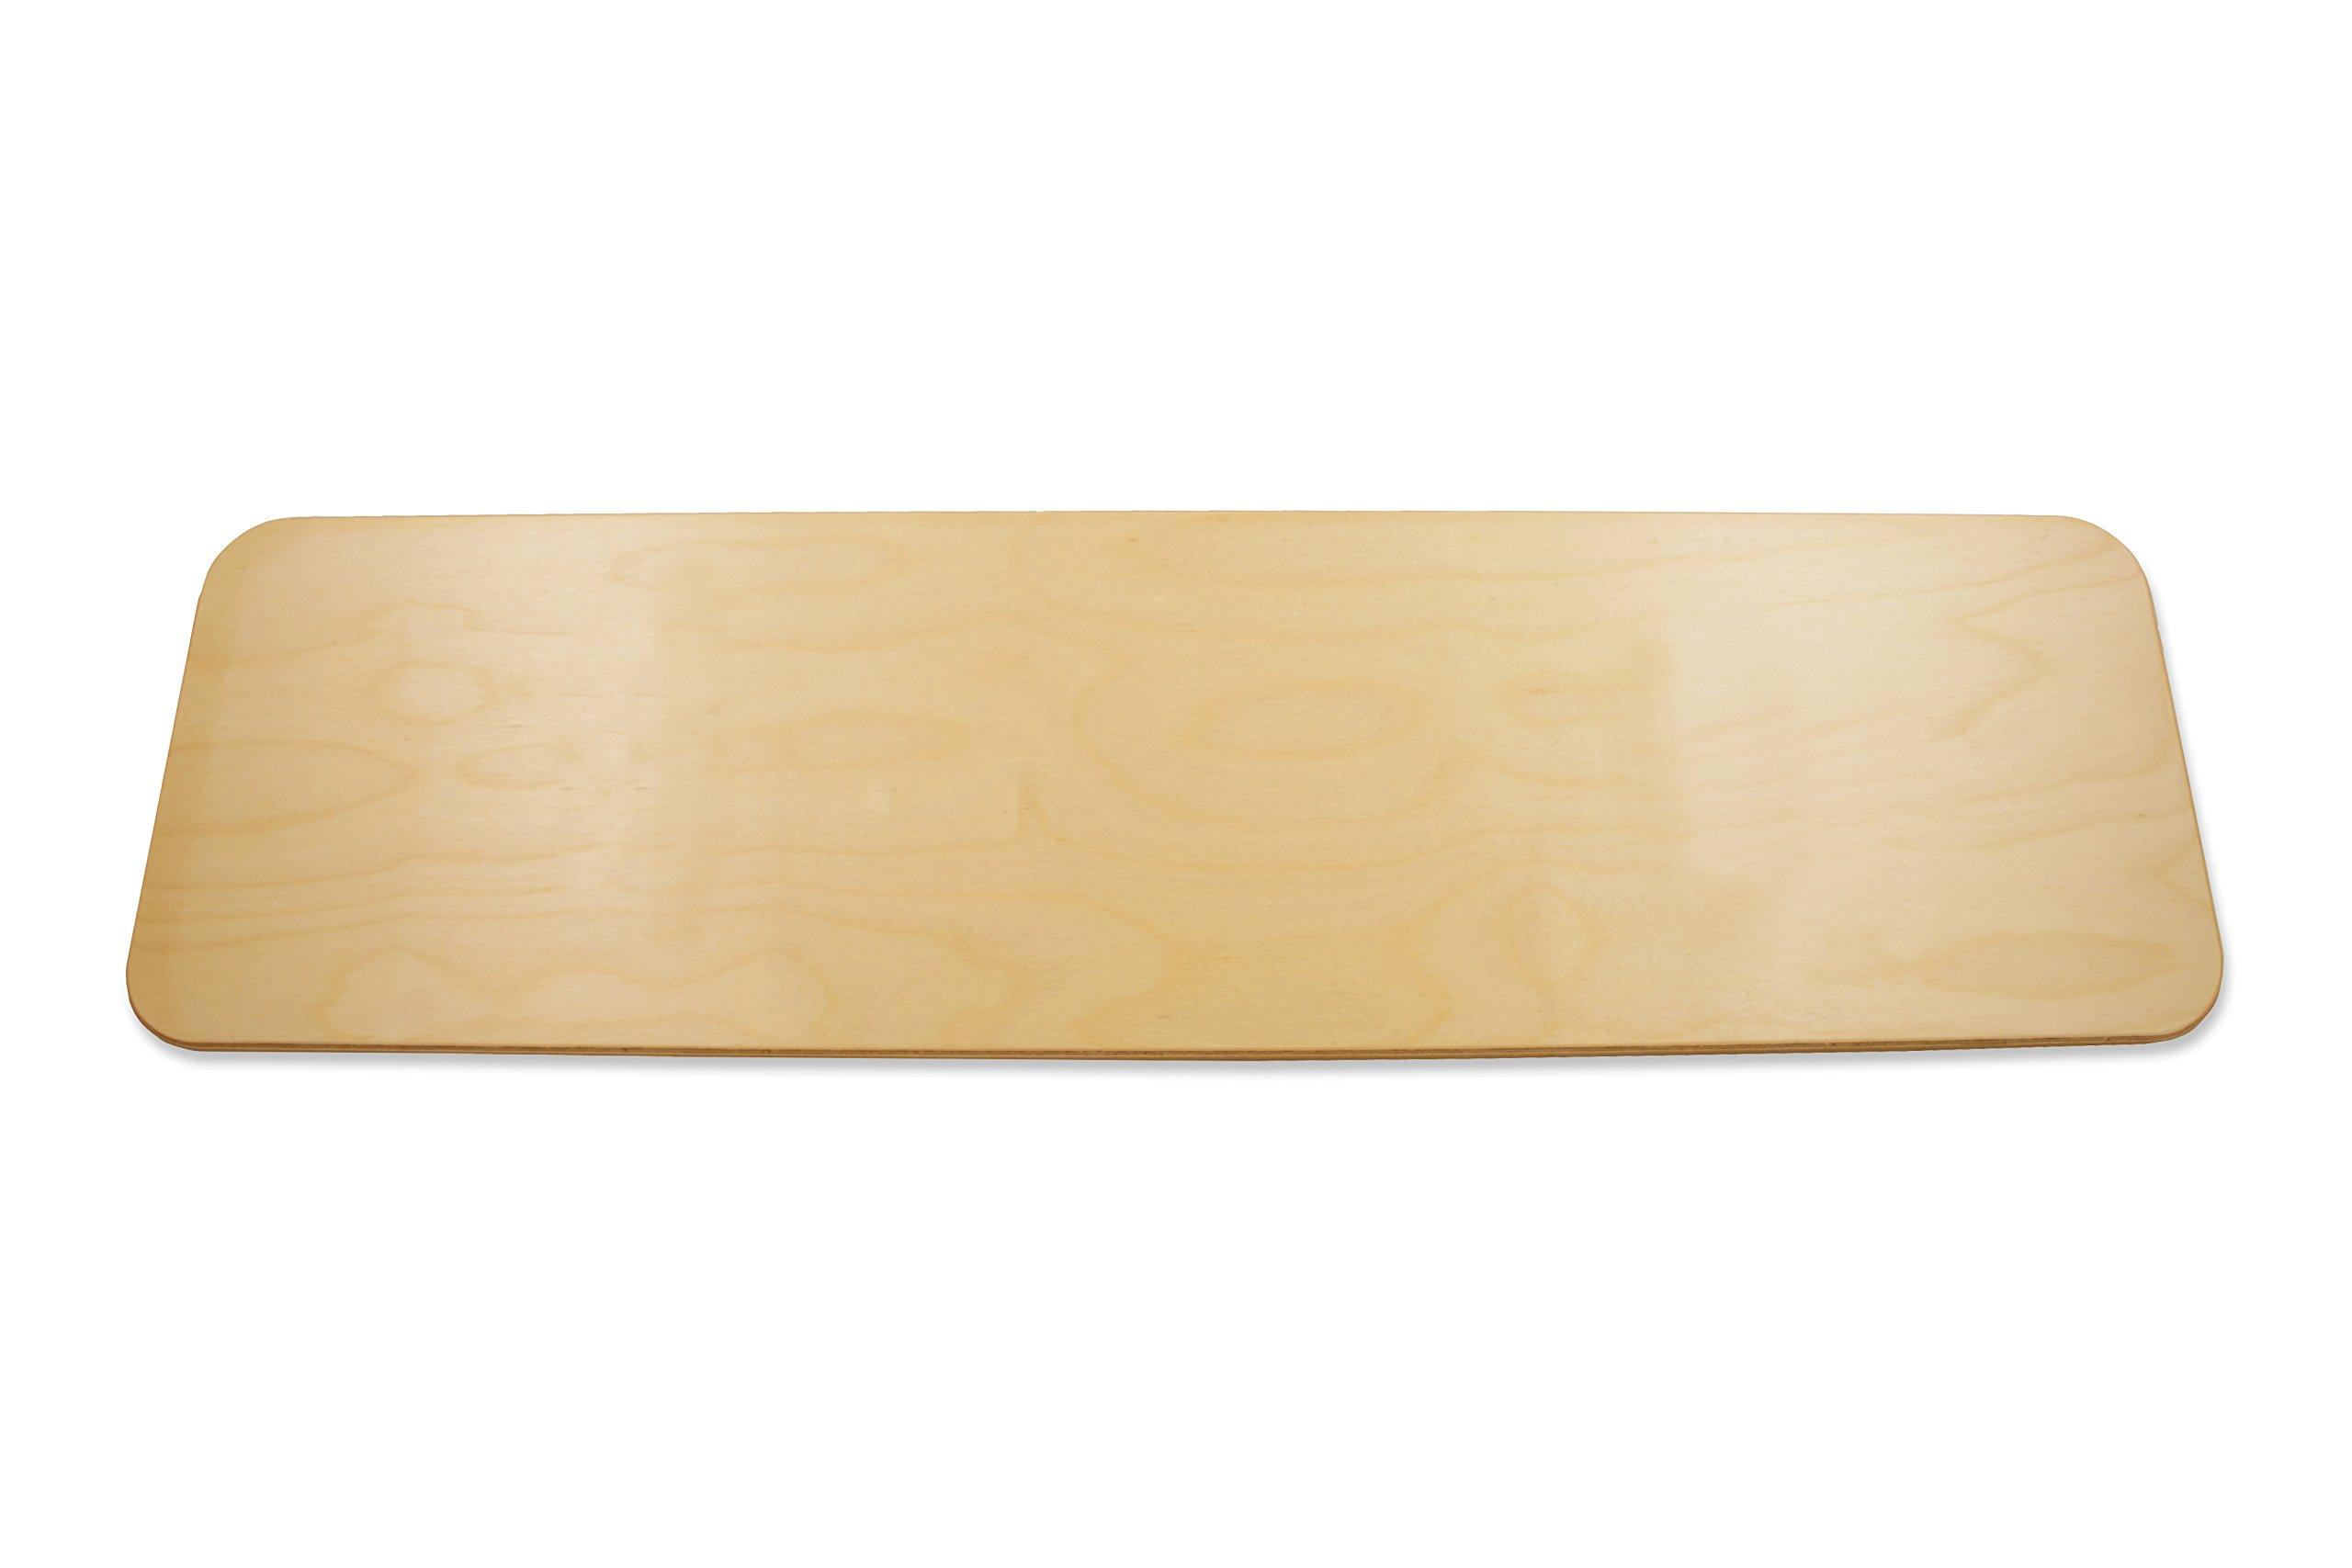 "Rehabilitation Advantage Durable Birch Wood Transfer Board, 3/8"" Thick x 26"" Long x 8"" Wide"